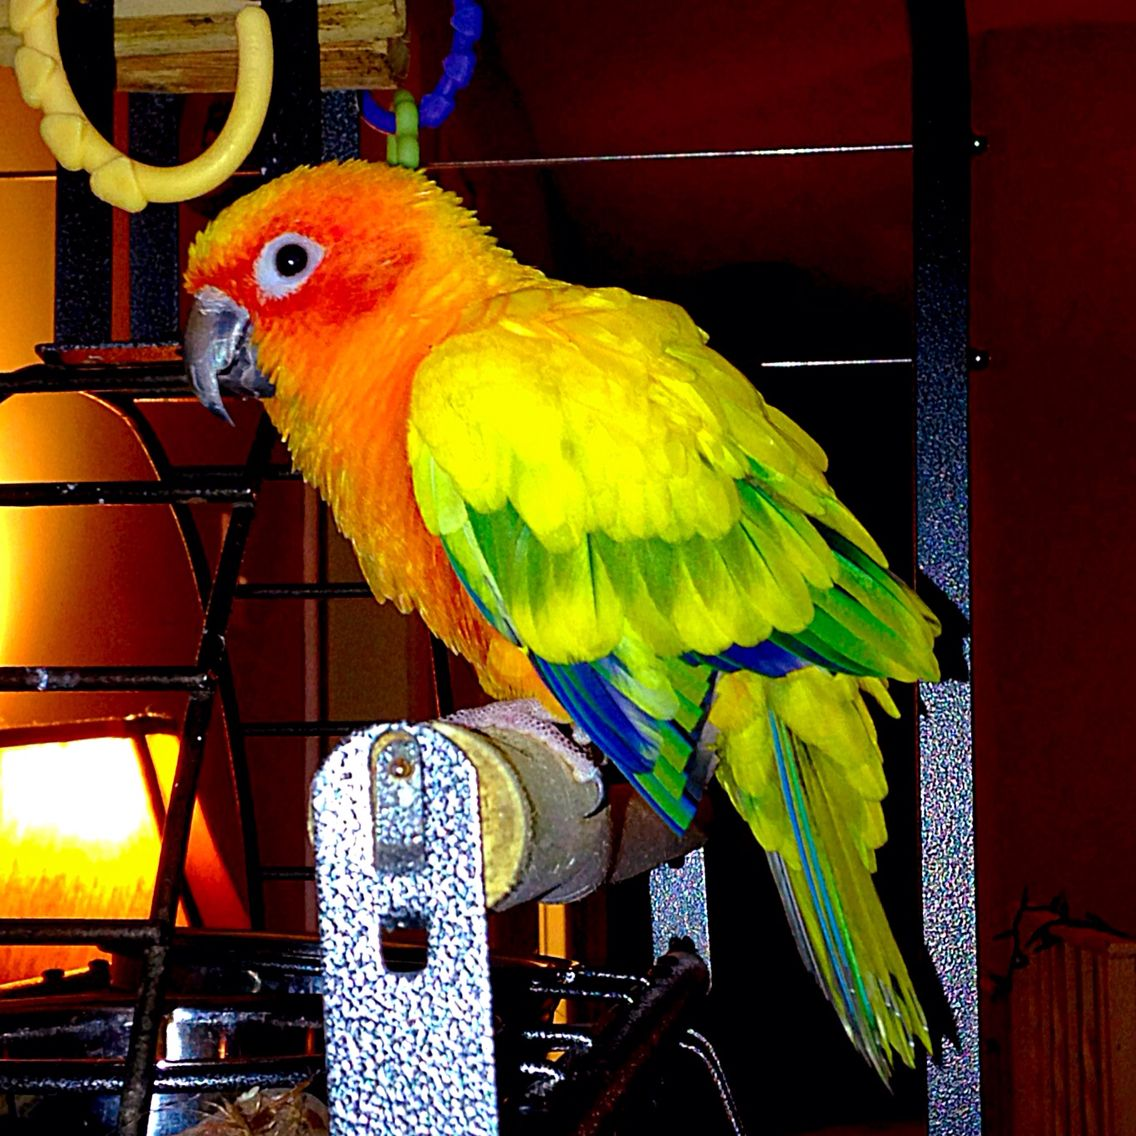 Meet Bowser, my new sun conure!